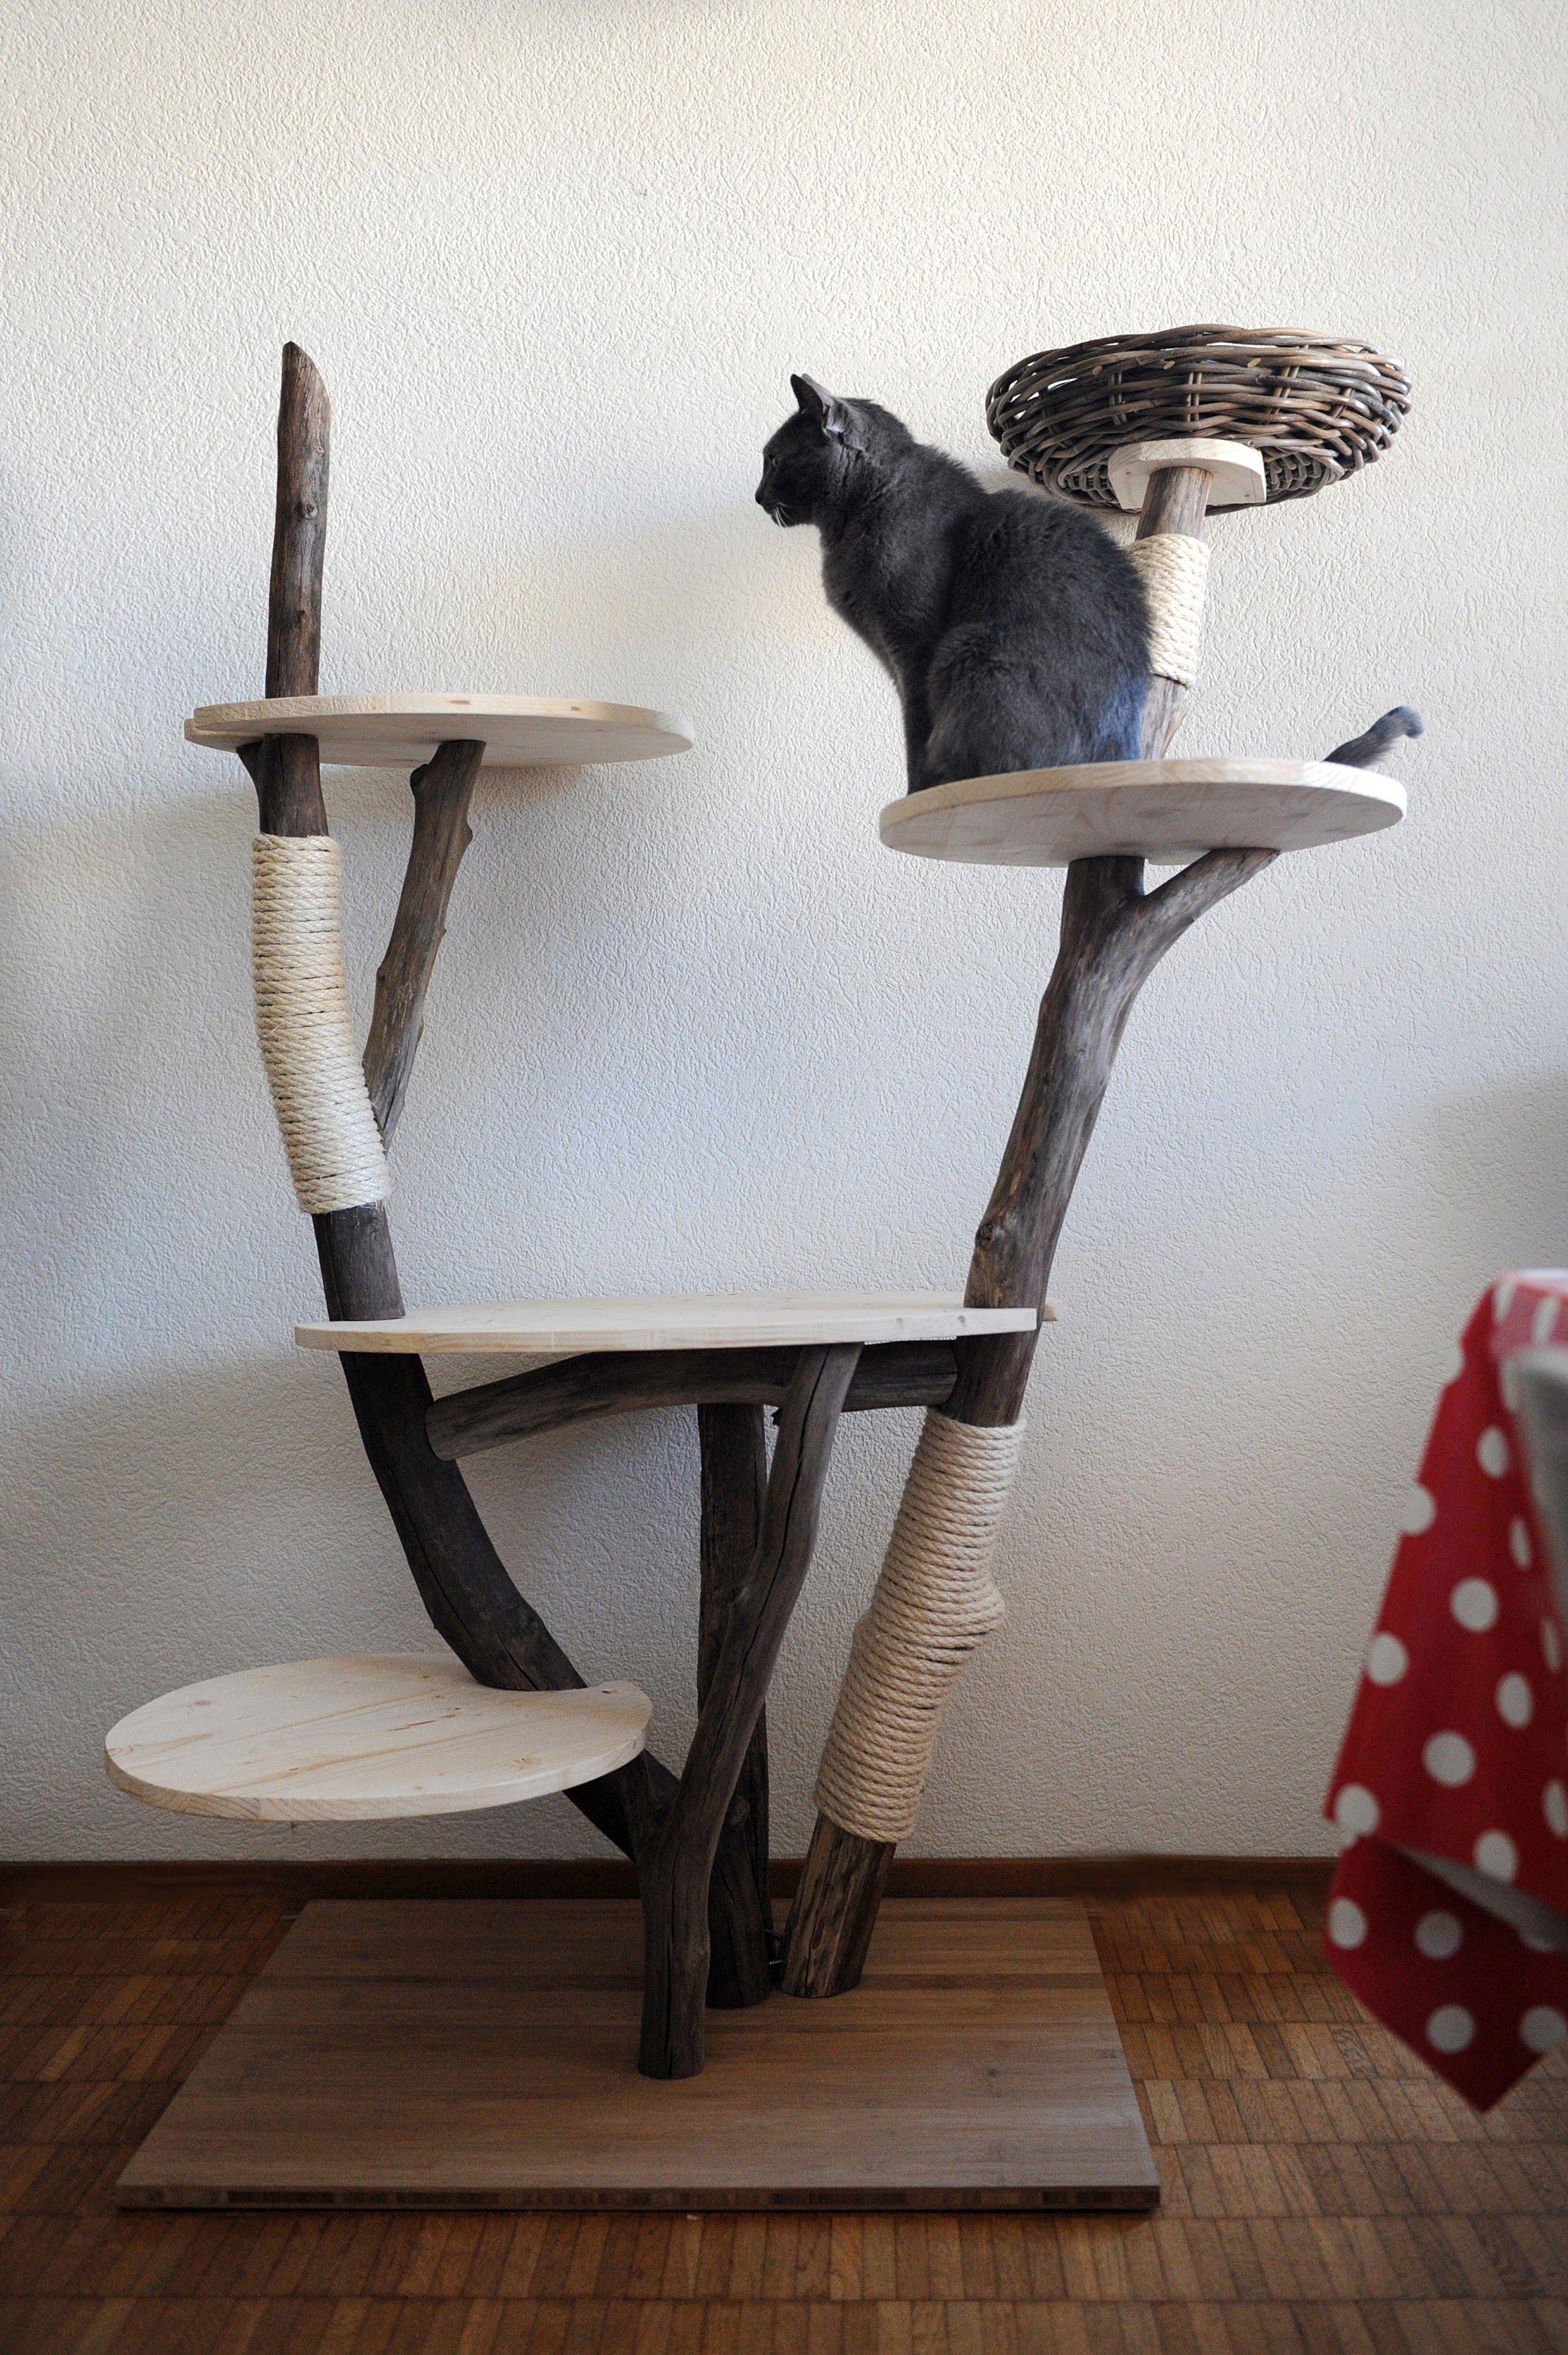 arbre chat en bois flott deco bois flott pinterest. Black Bedroom Furniture Sets. Home Design Ideas